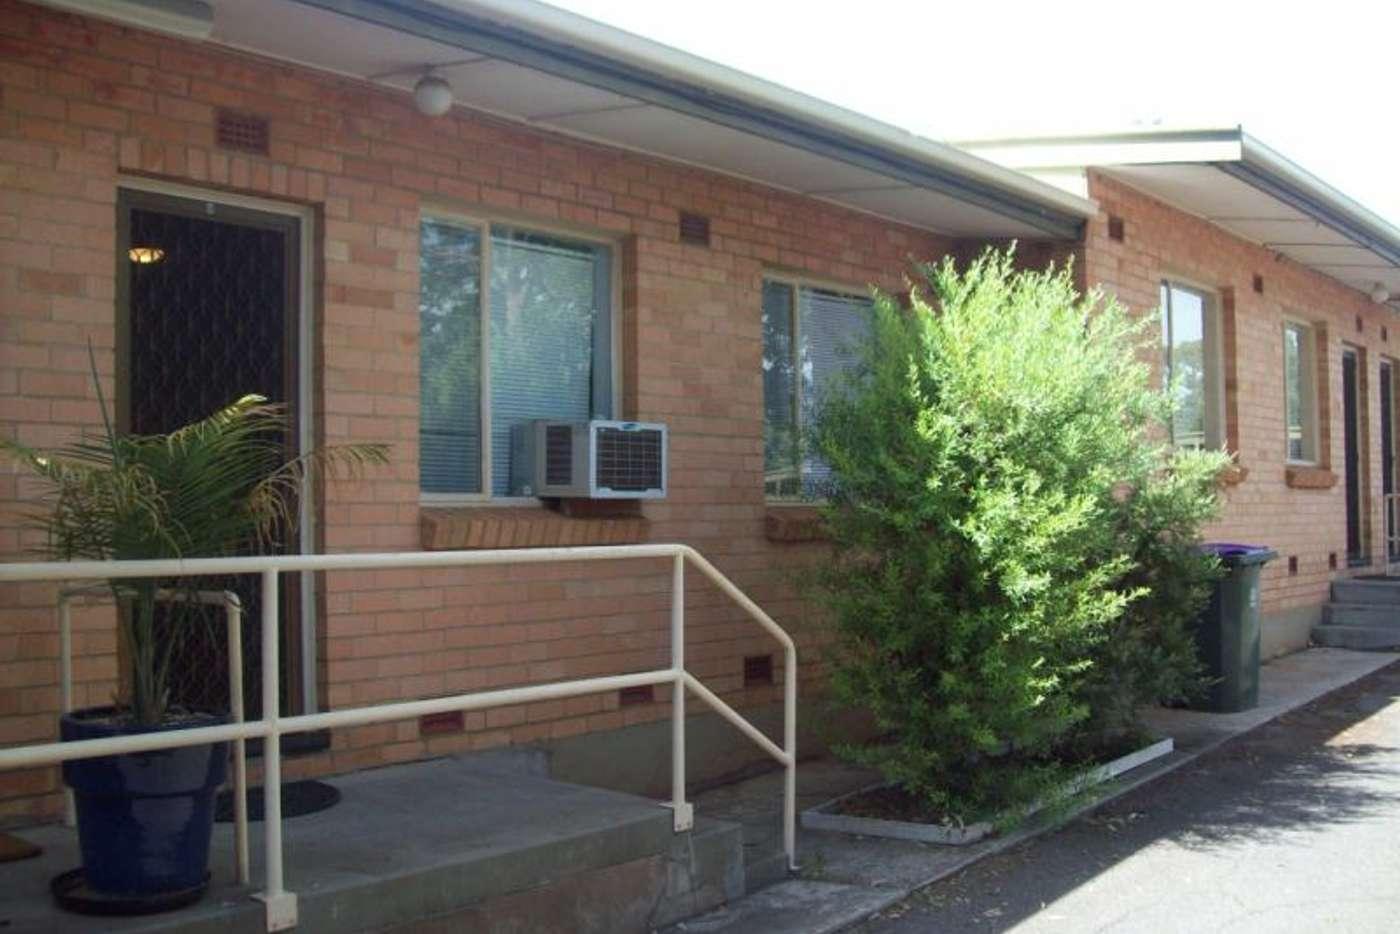 Main view of Homely unit listing, 4/6 Chapel Street, Magill SA 5072